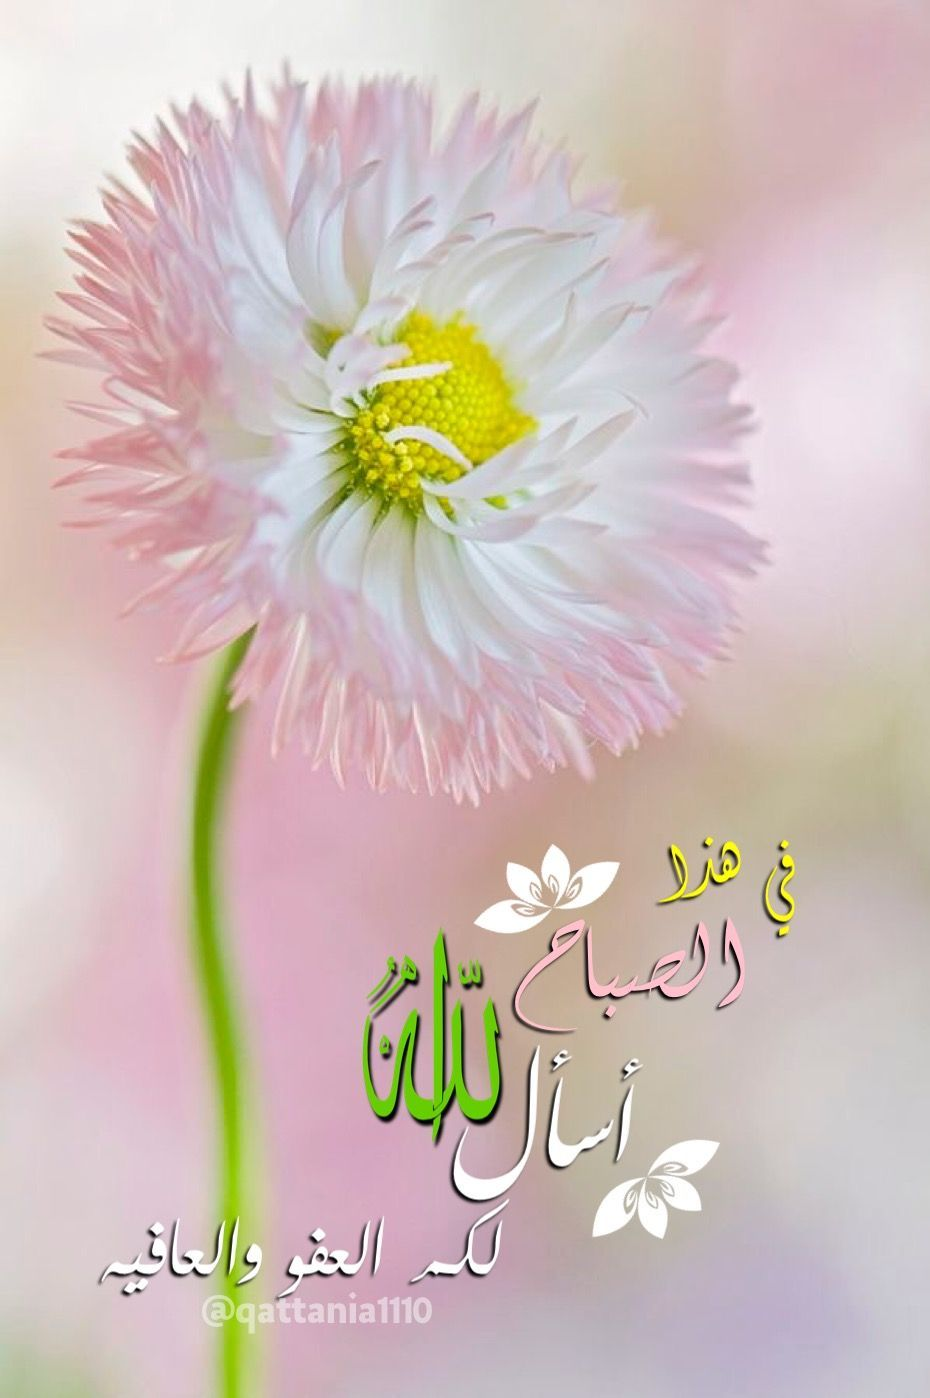 Pin By Ali علي On صباح الخير Good Morning Good Morning Greetings Morning Greeting Good Night Messages